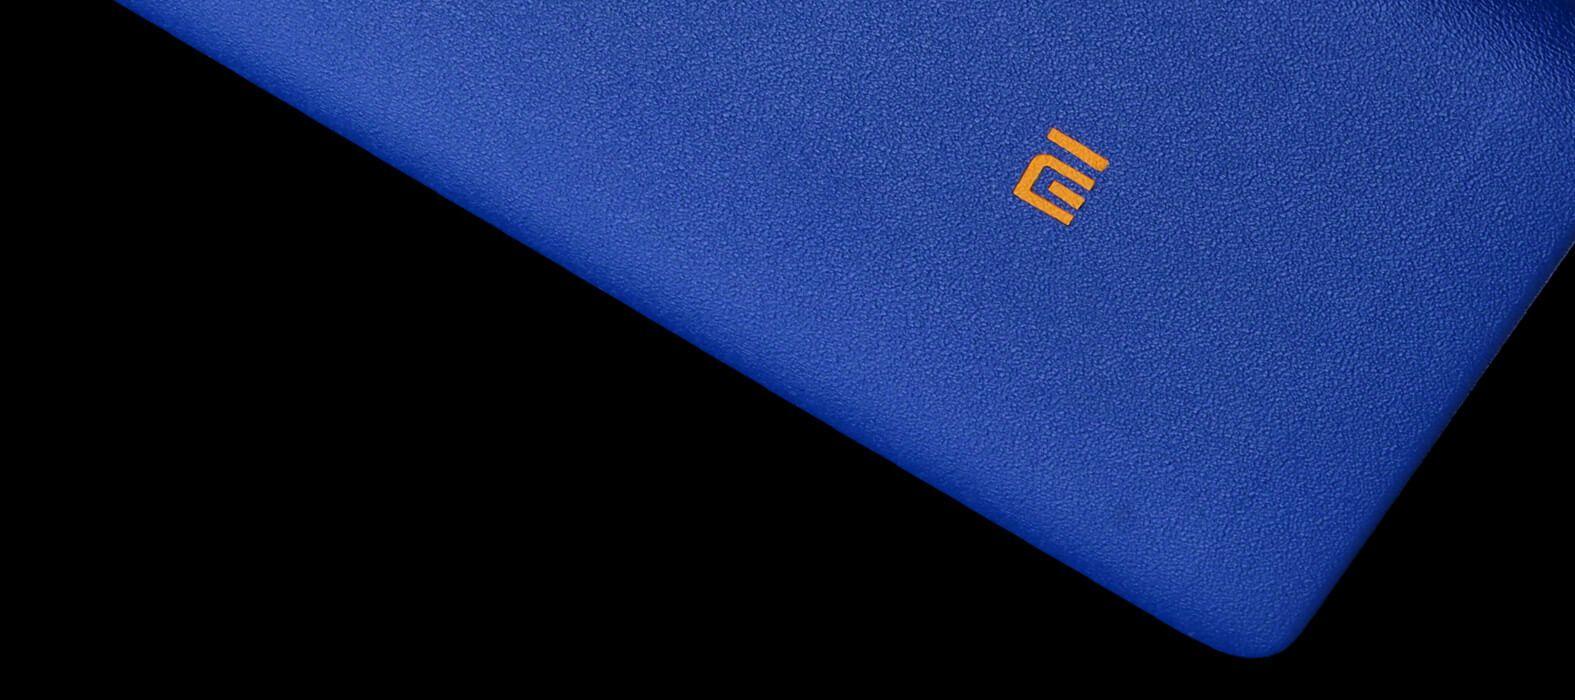 Sandstone Blue Redmi Note 4 Wraps & Skins